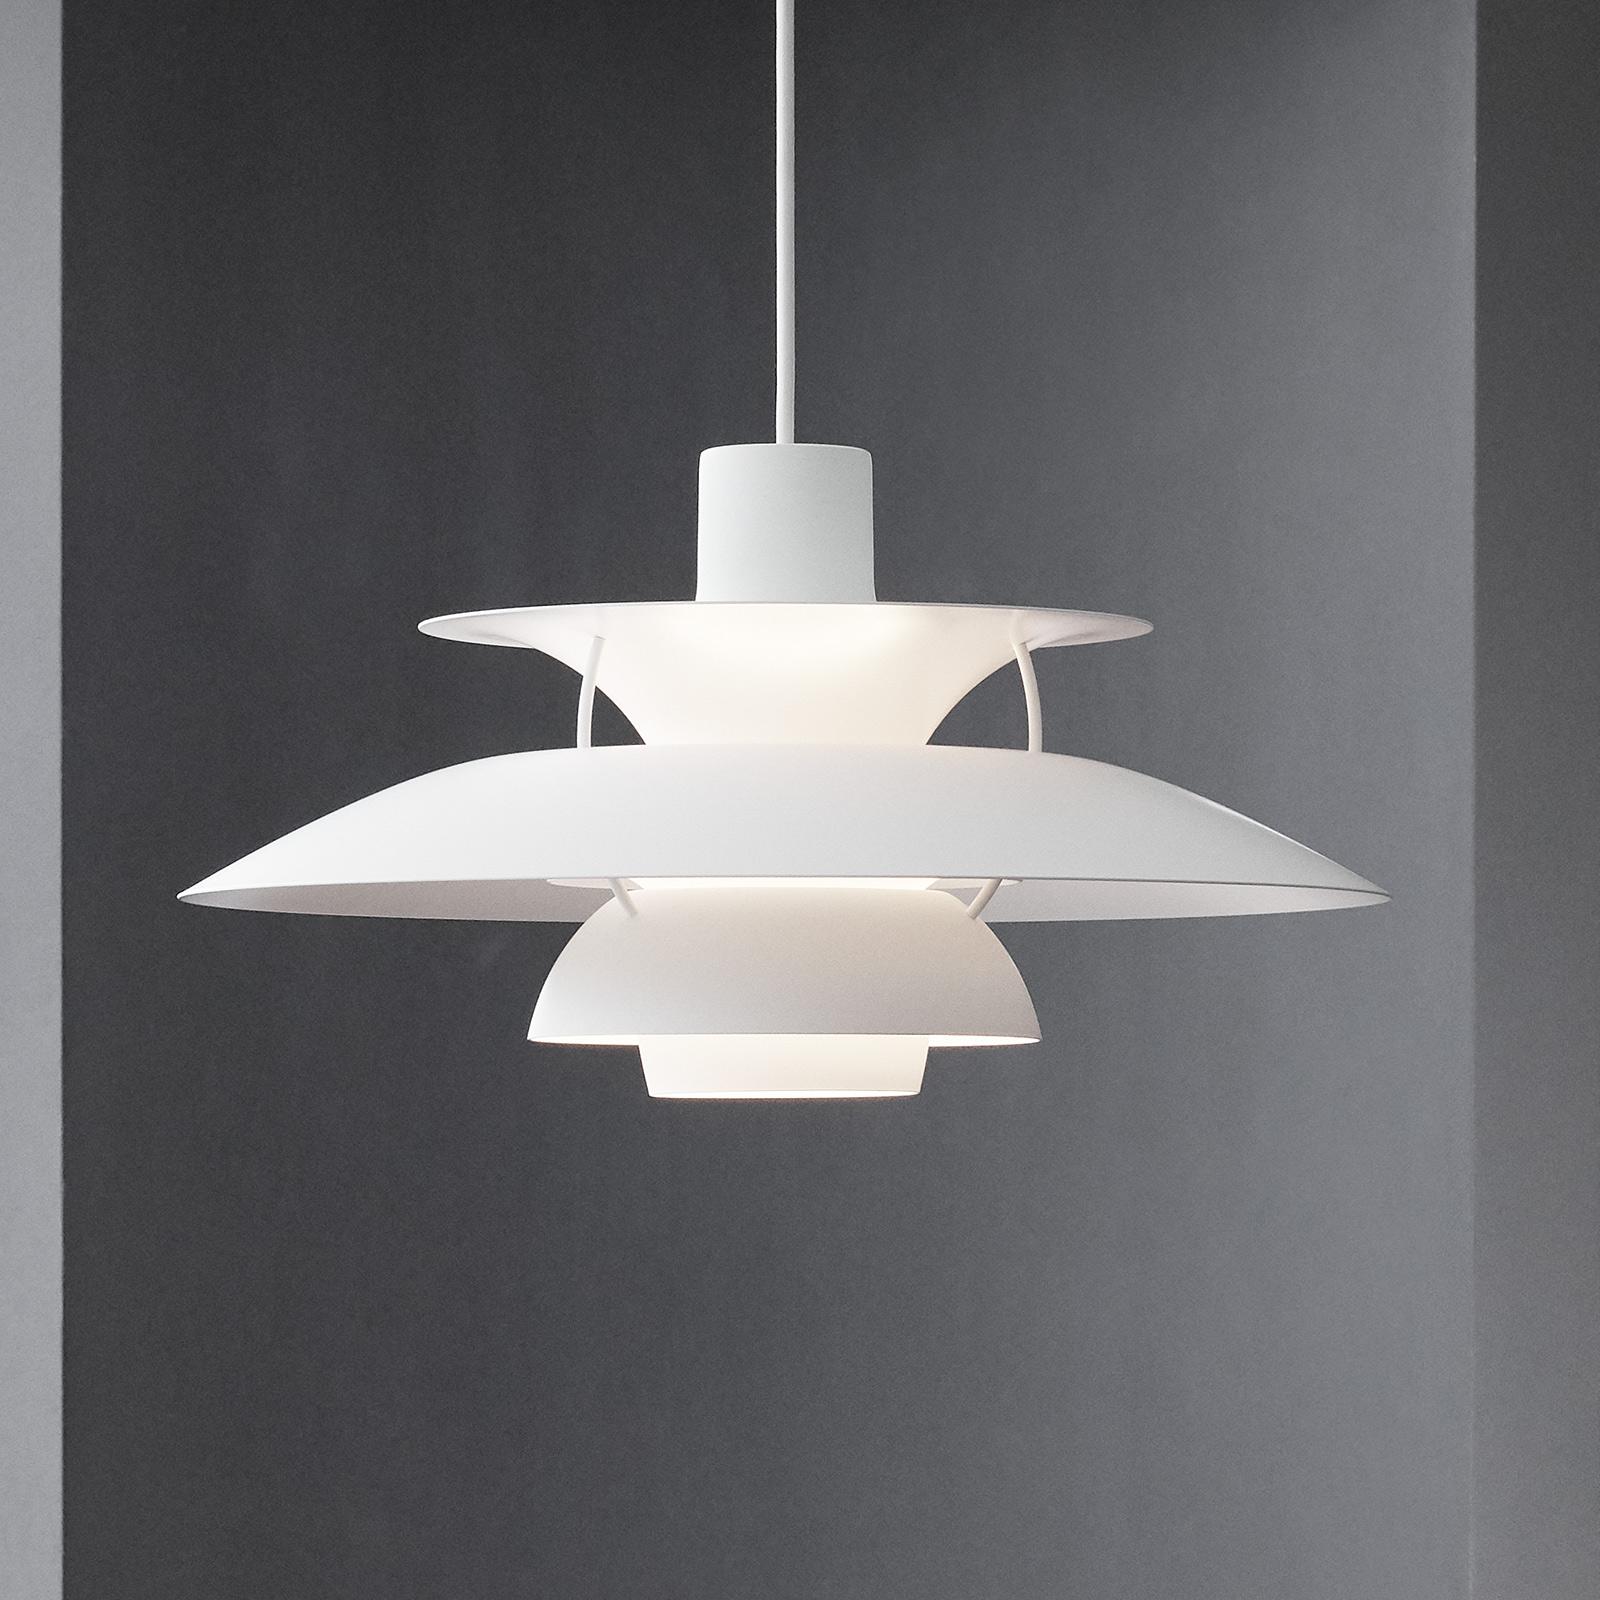 Louis Poulsen PH 5 Mini hanglamp monochroom wit